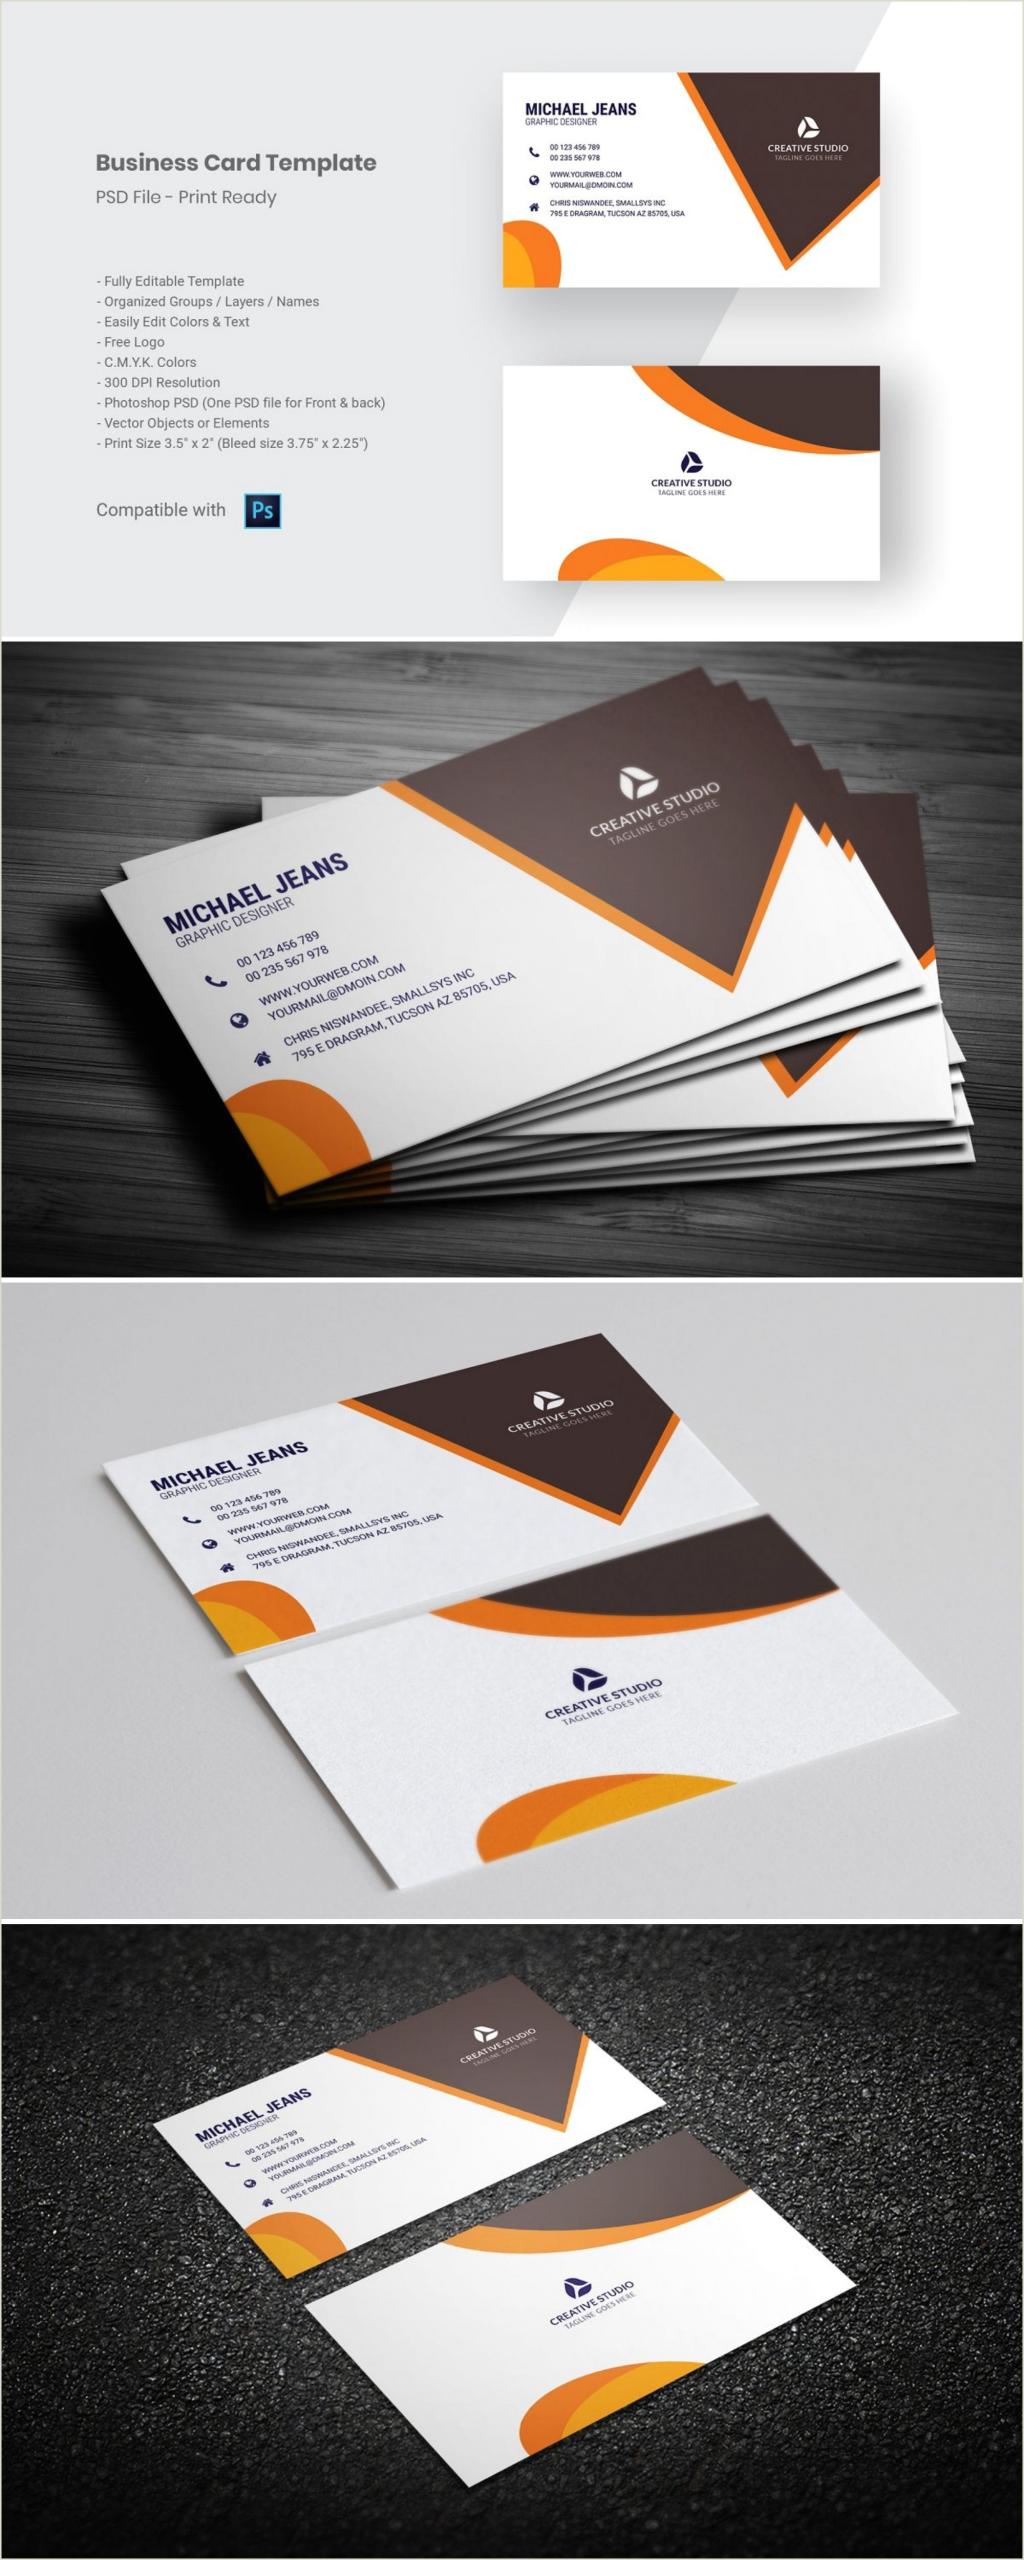 Business Card Background Designs Modern Business Card Template